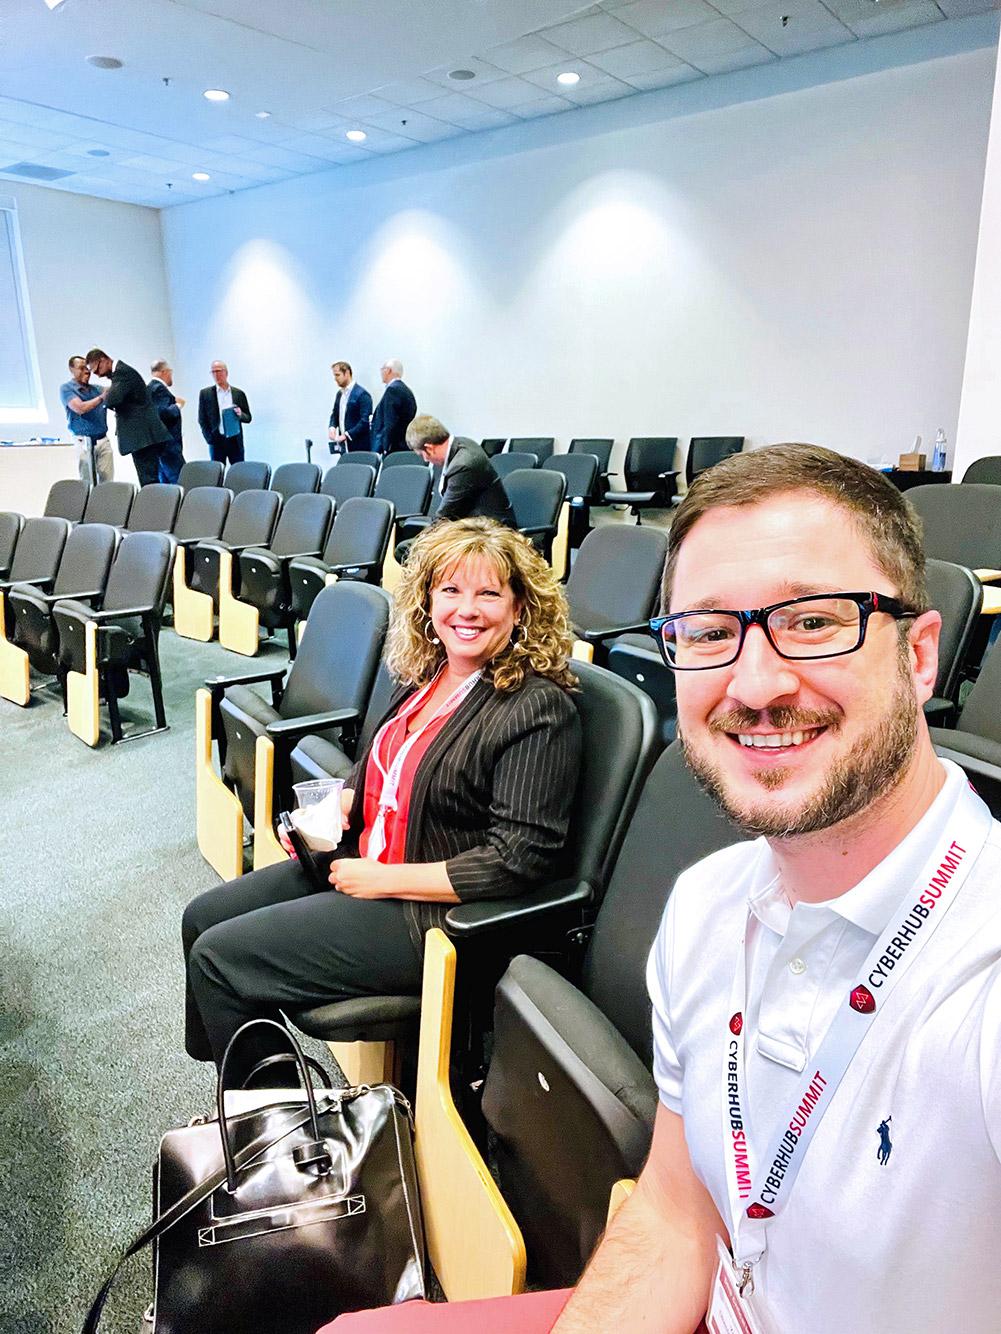 Kimberly Carter-Clark, Strategic Account Manager at Trenton Systems, and Yazz Krdzalic, Vice President of Marketing at Trenton Systems